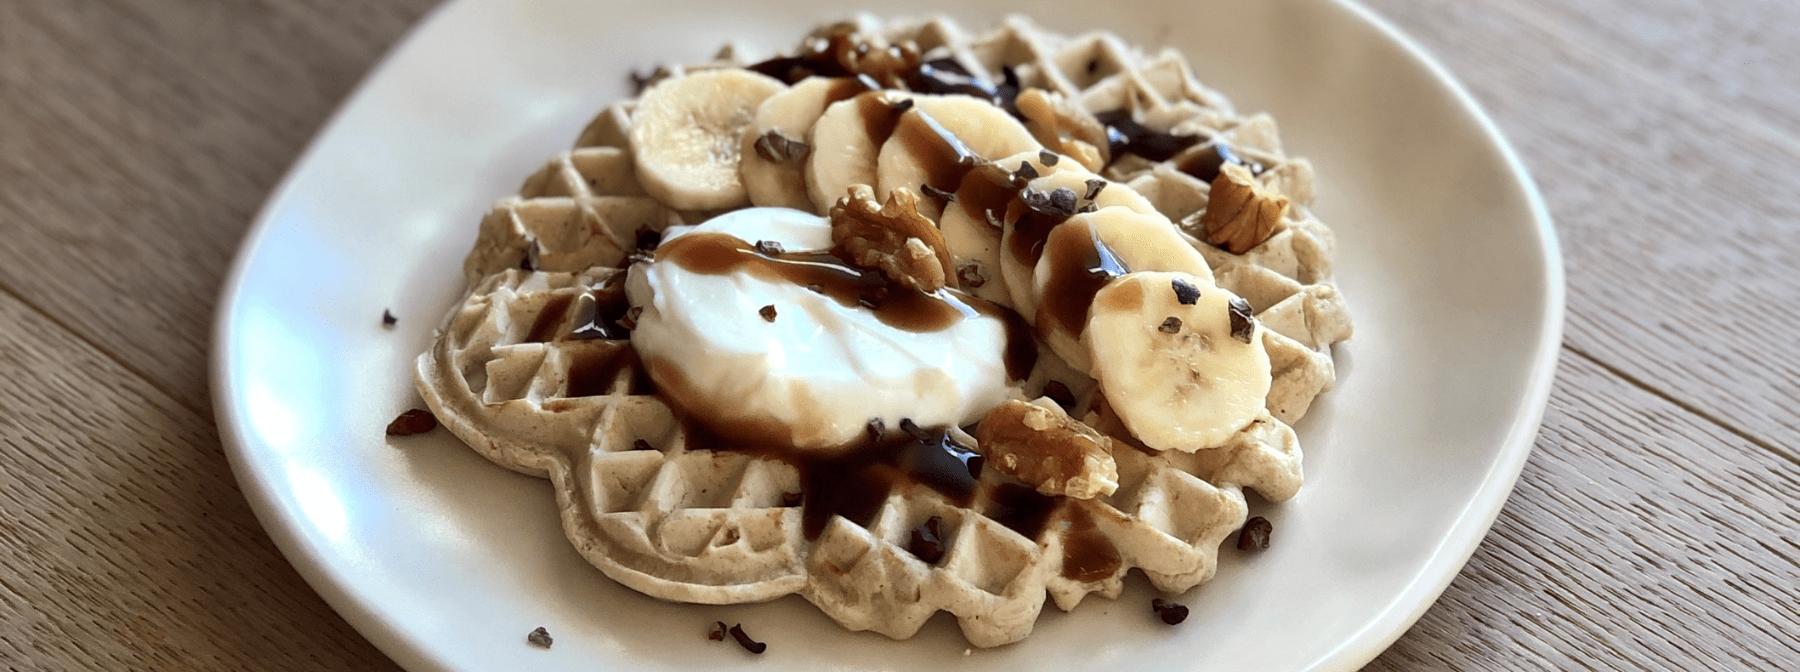 Waffles vegani | Ricette vegane veloci